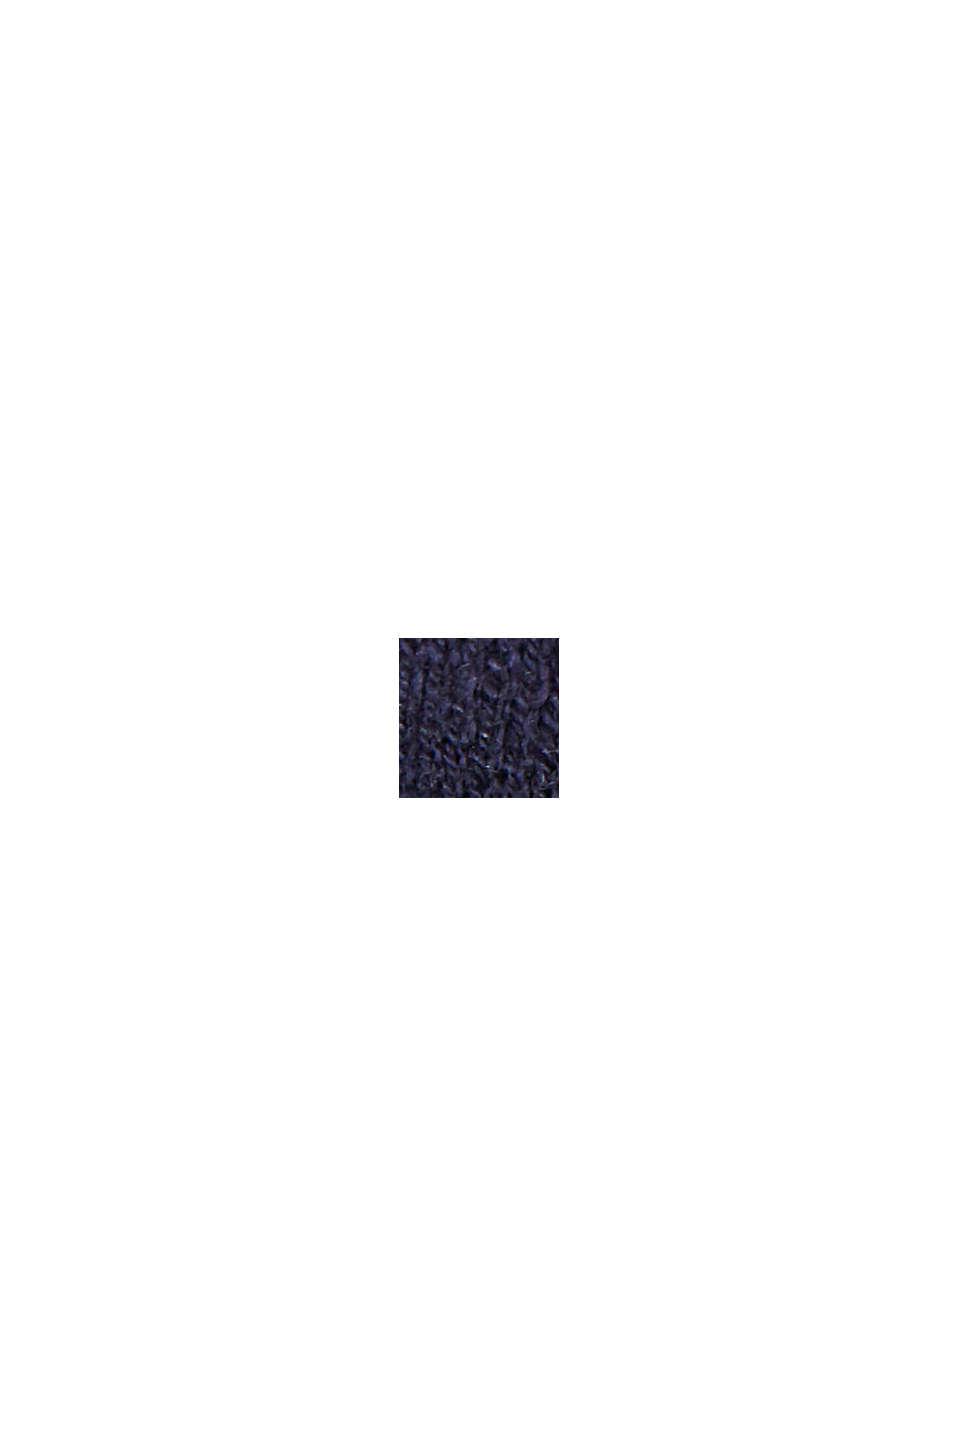 Leinen/Organic Cotton: V-Neck Cardigan, NAVY, swatch